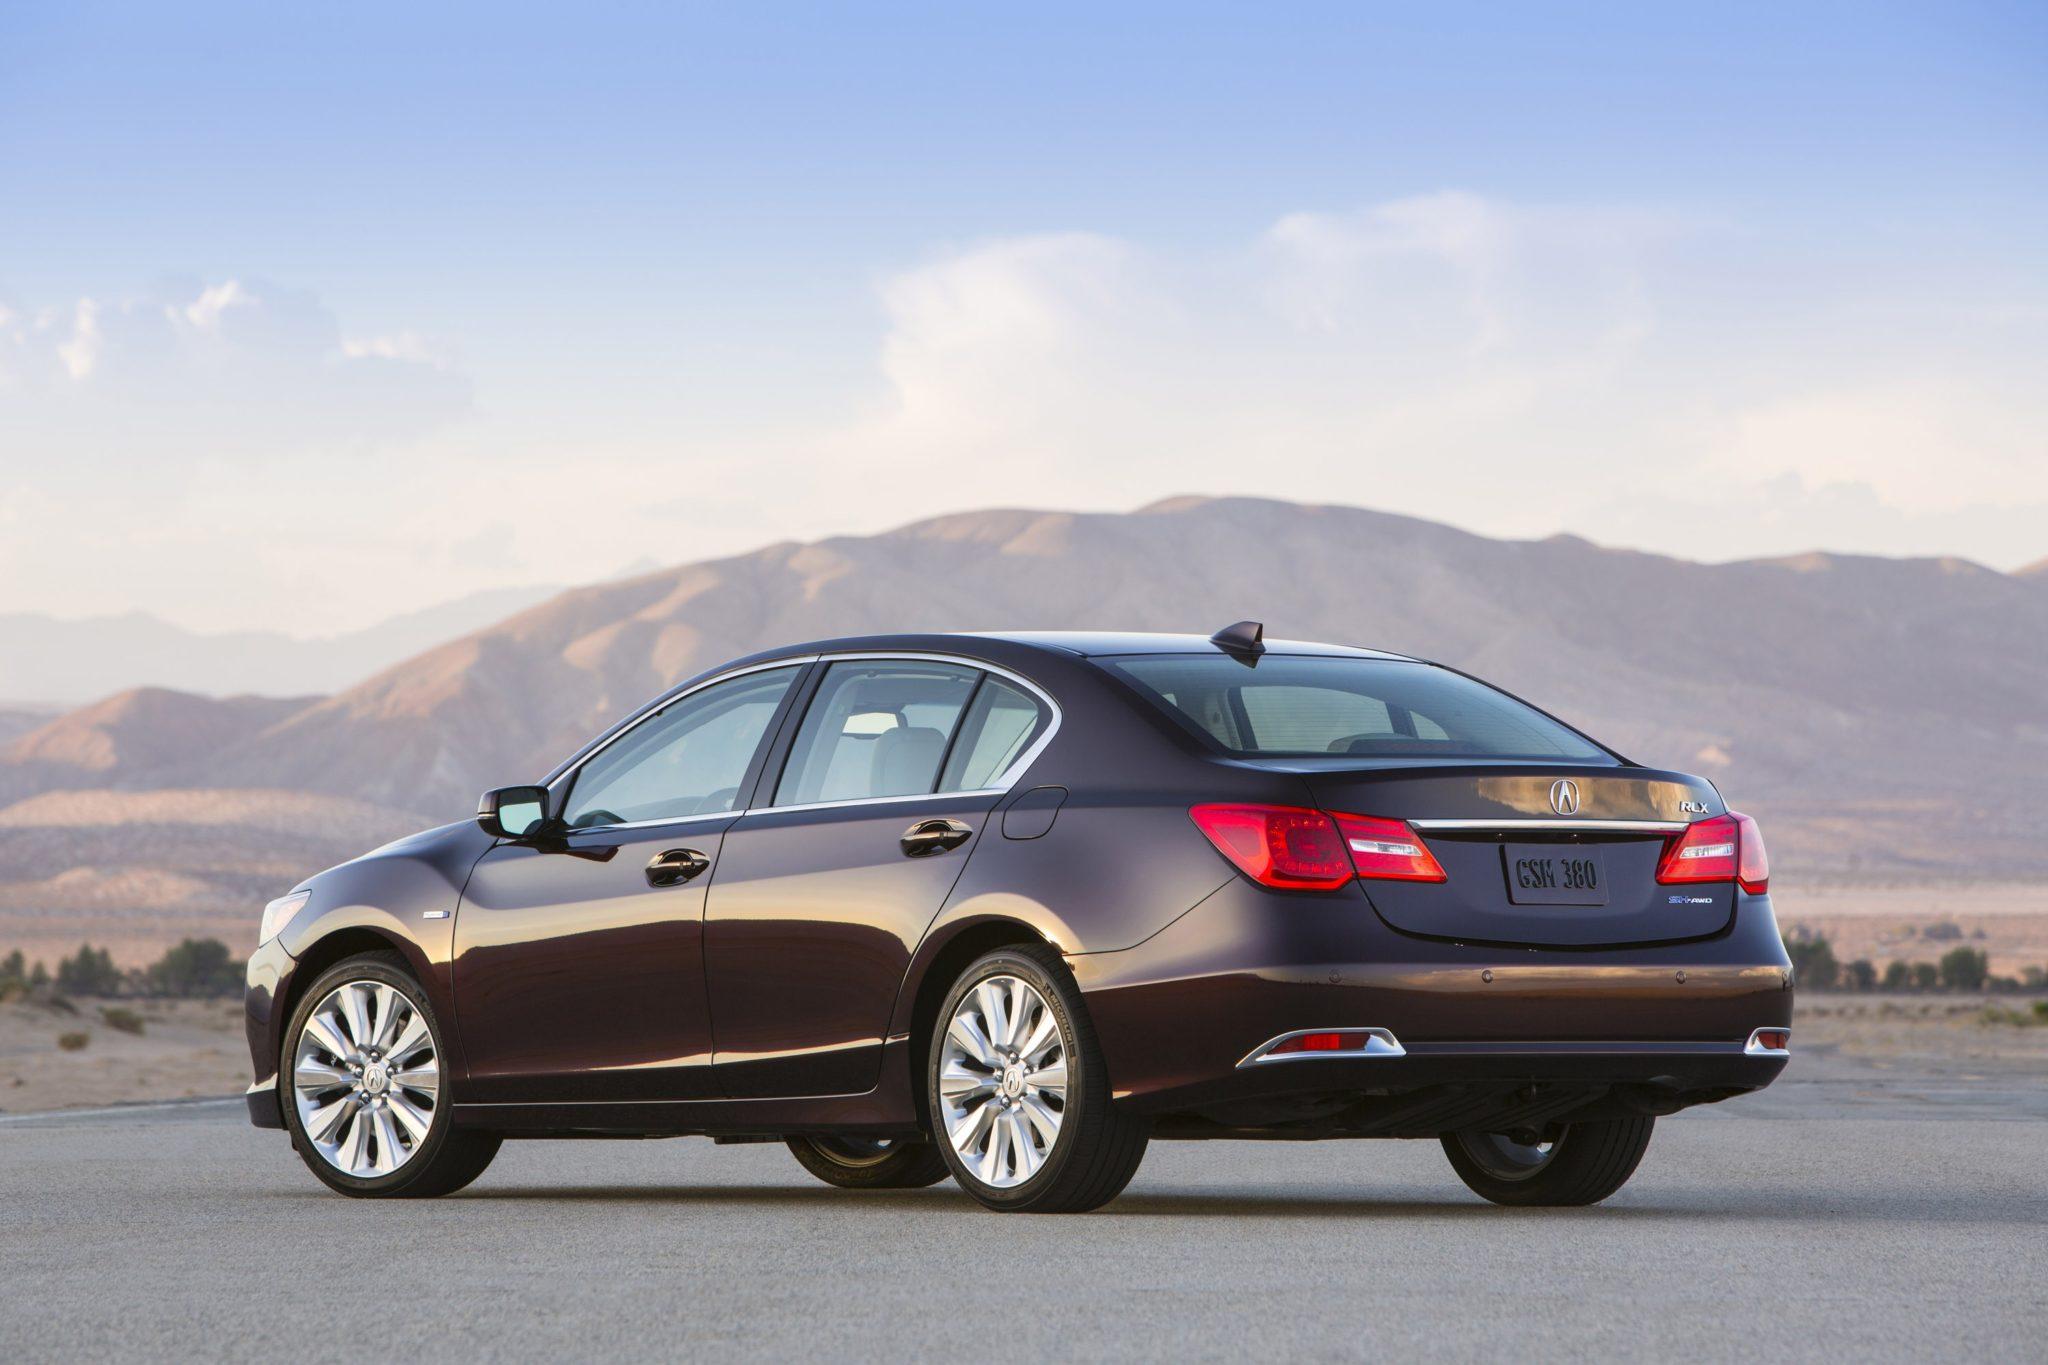 2014 Acura RLX Sport Hybrid SH AWD